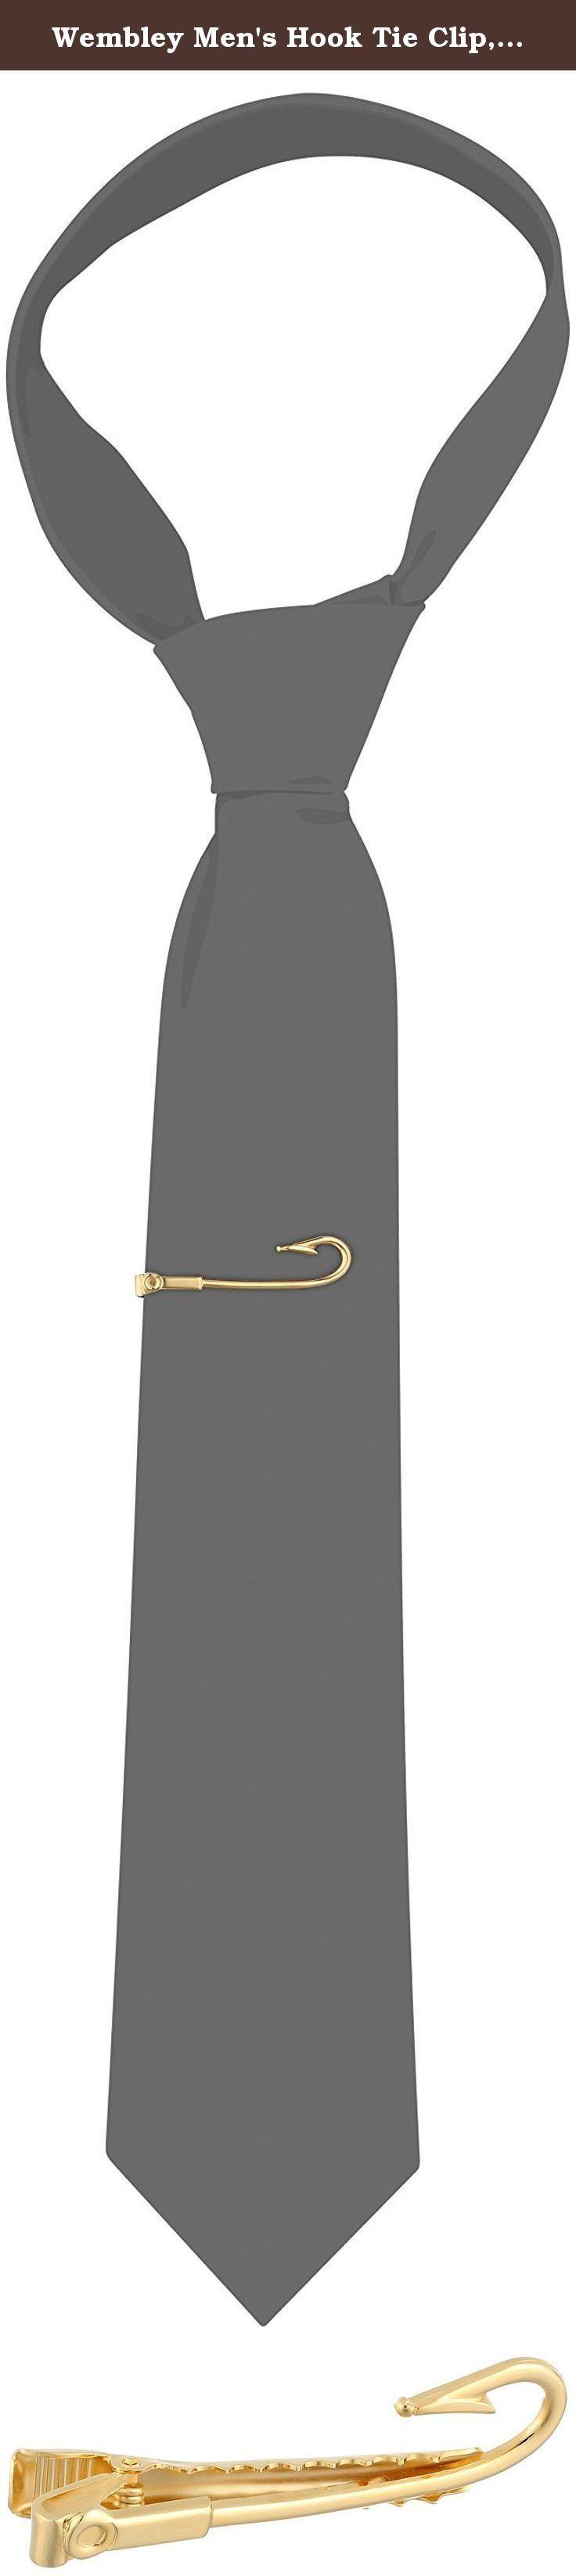 Wembley Men's Hook Tie Clip, Gold, One Size. Hook tie clip.